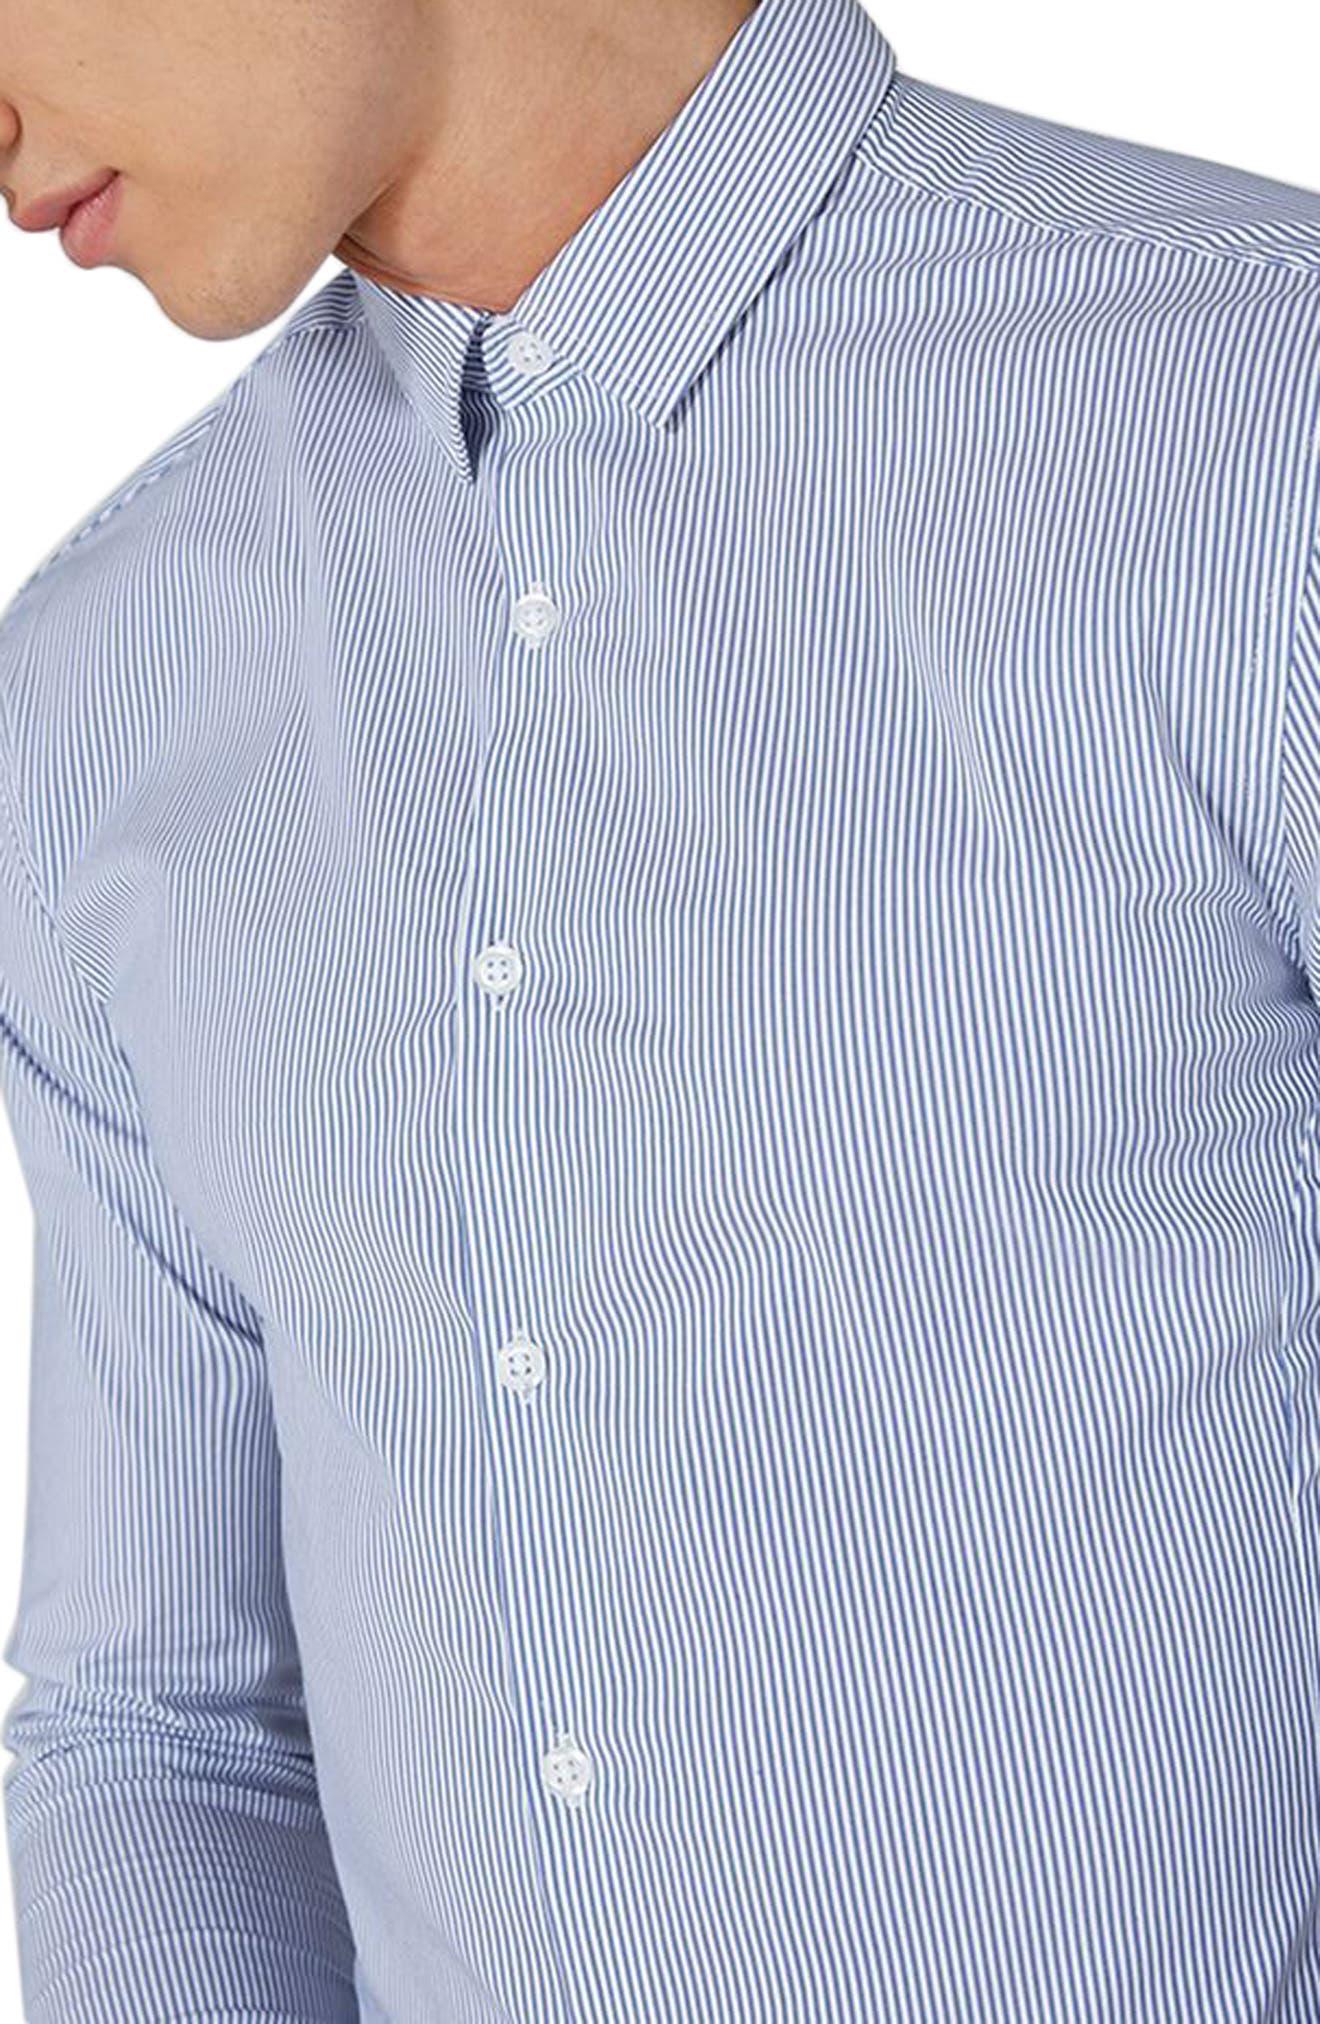 Muscle Fit Smart Shirt,                             Alternate thumbnail 2, color,                             400